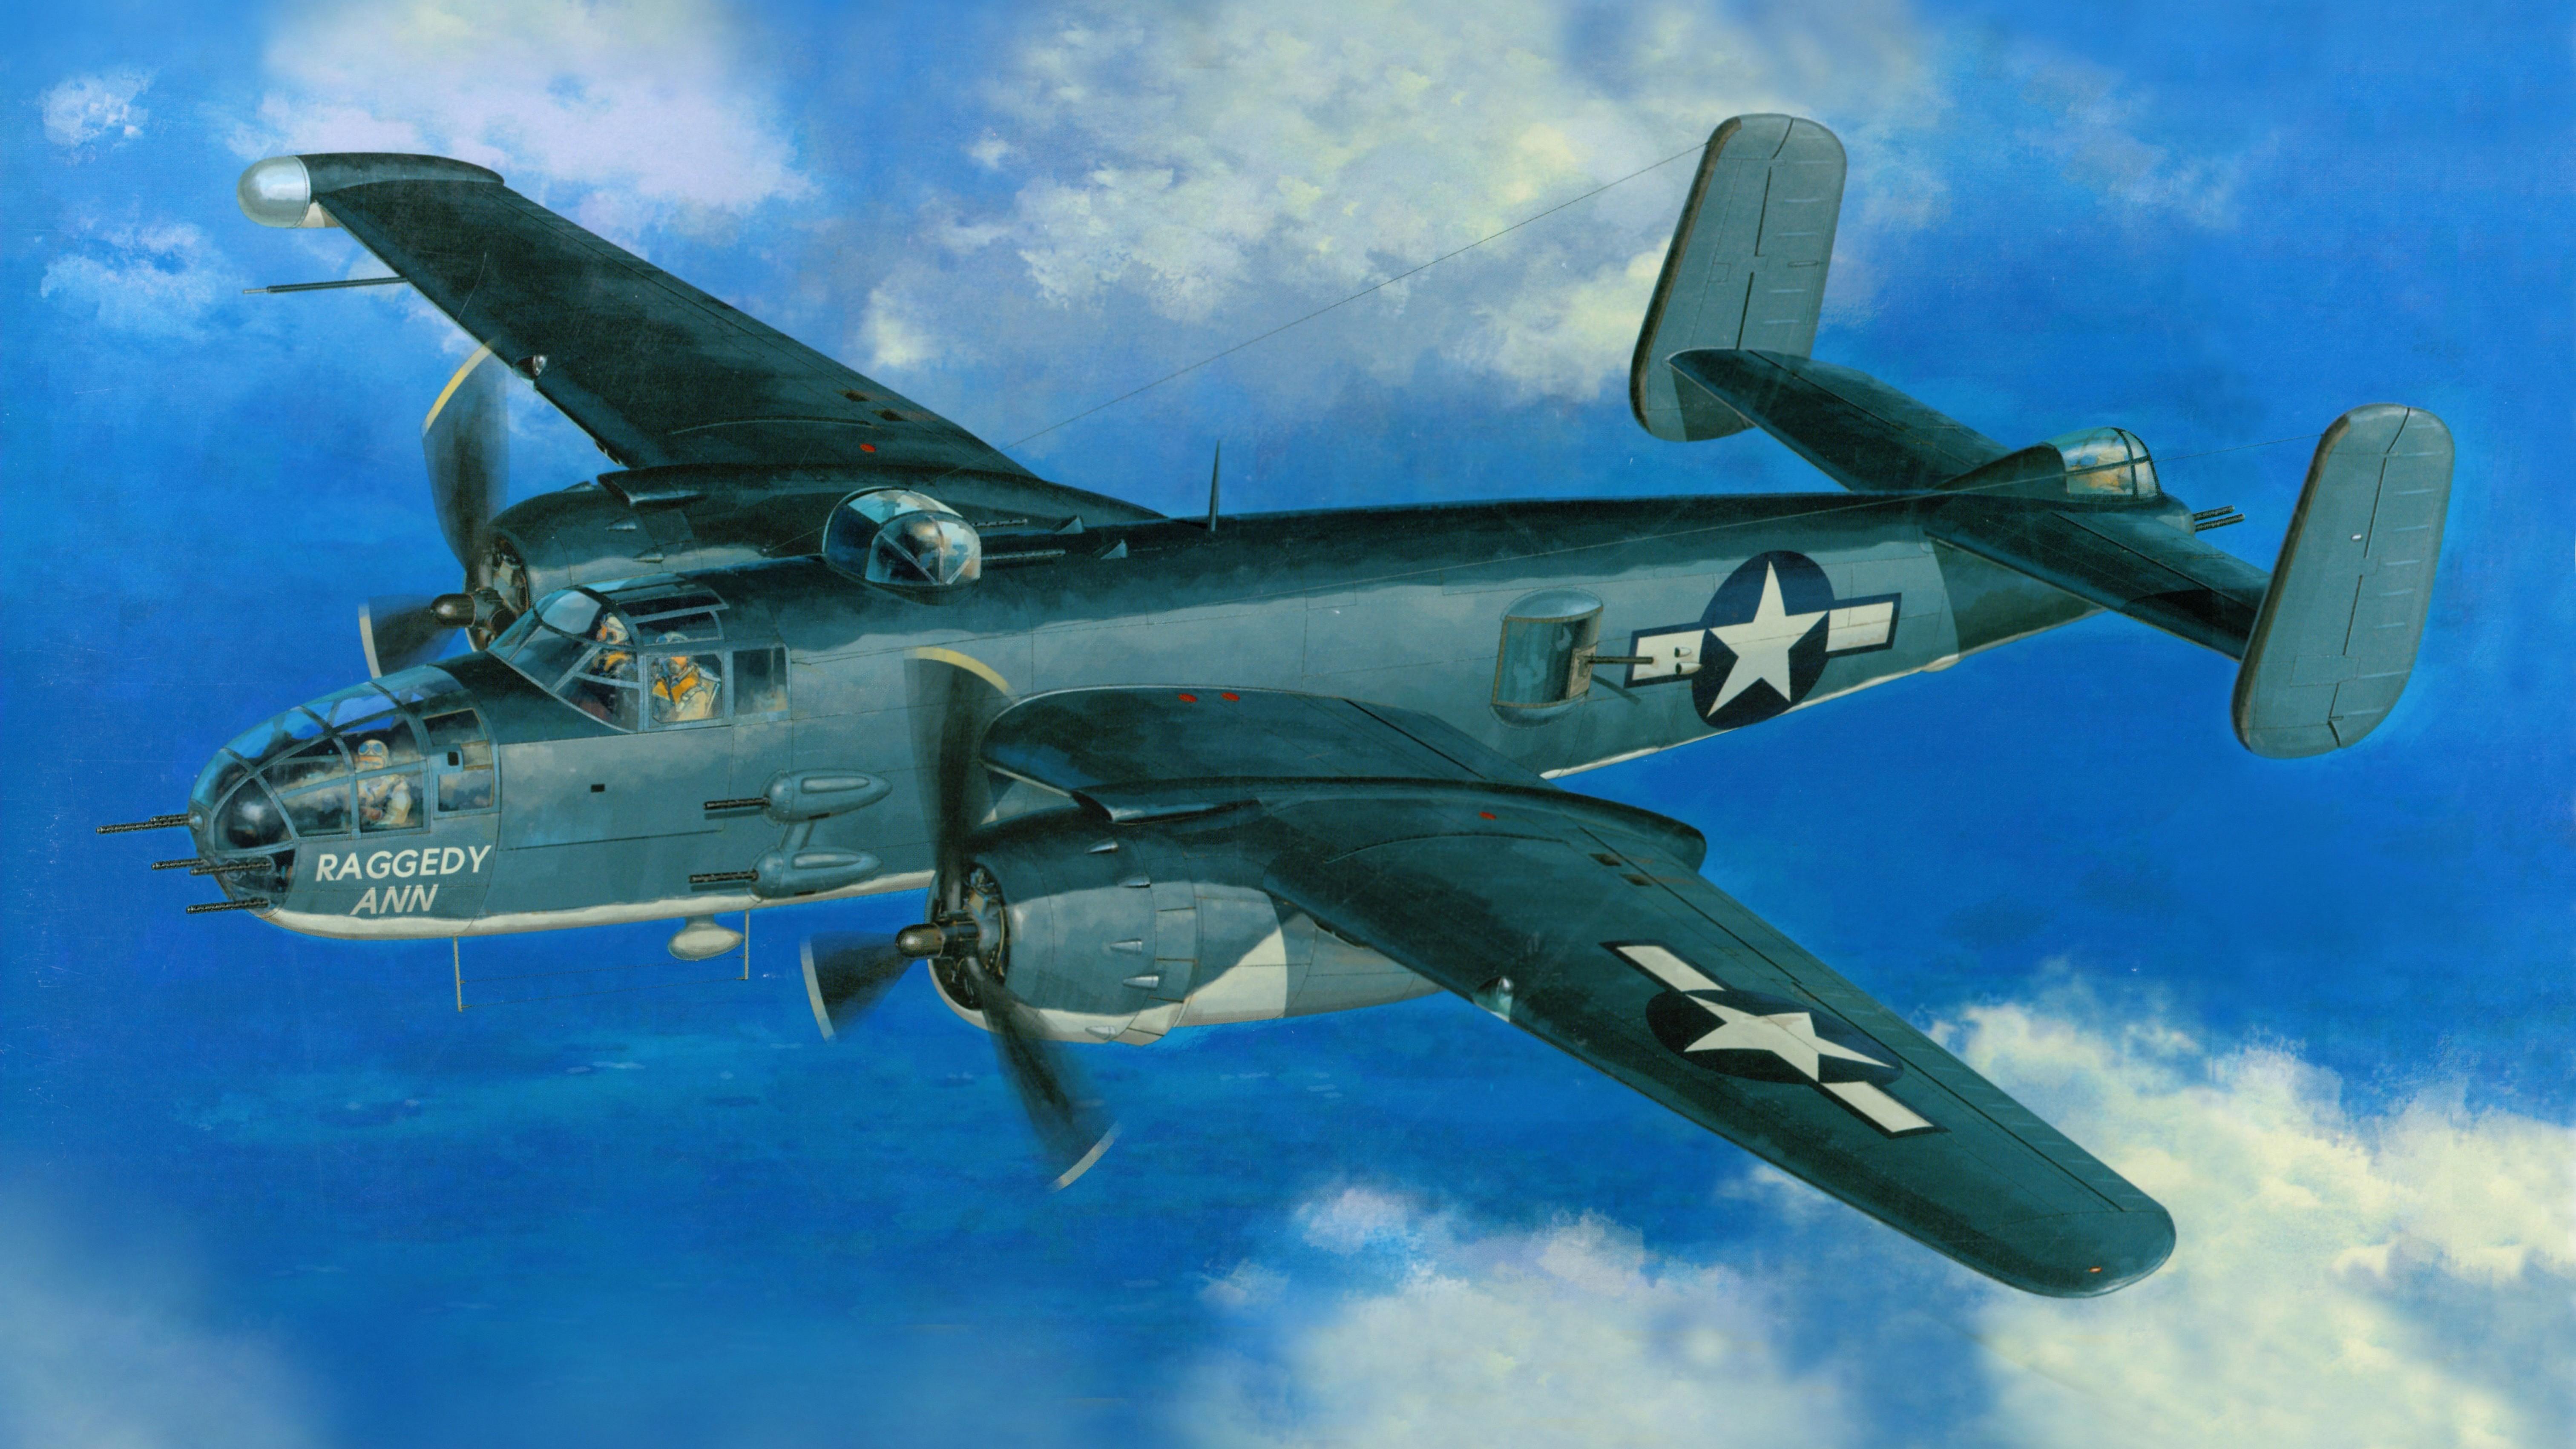 Wallpaper : vehicle, artwork, airplane, military aircraft